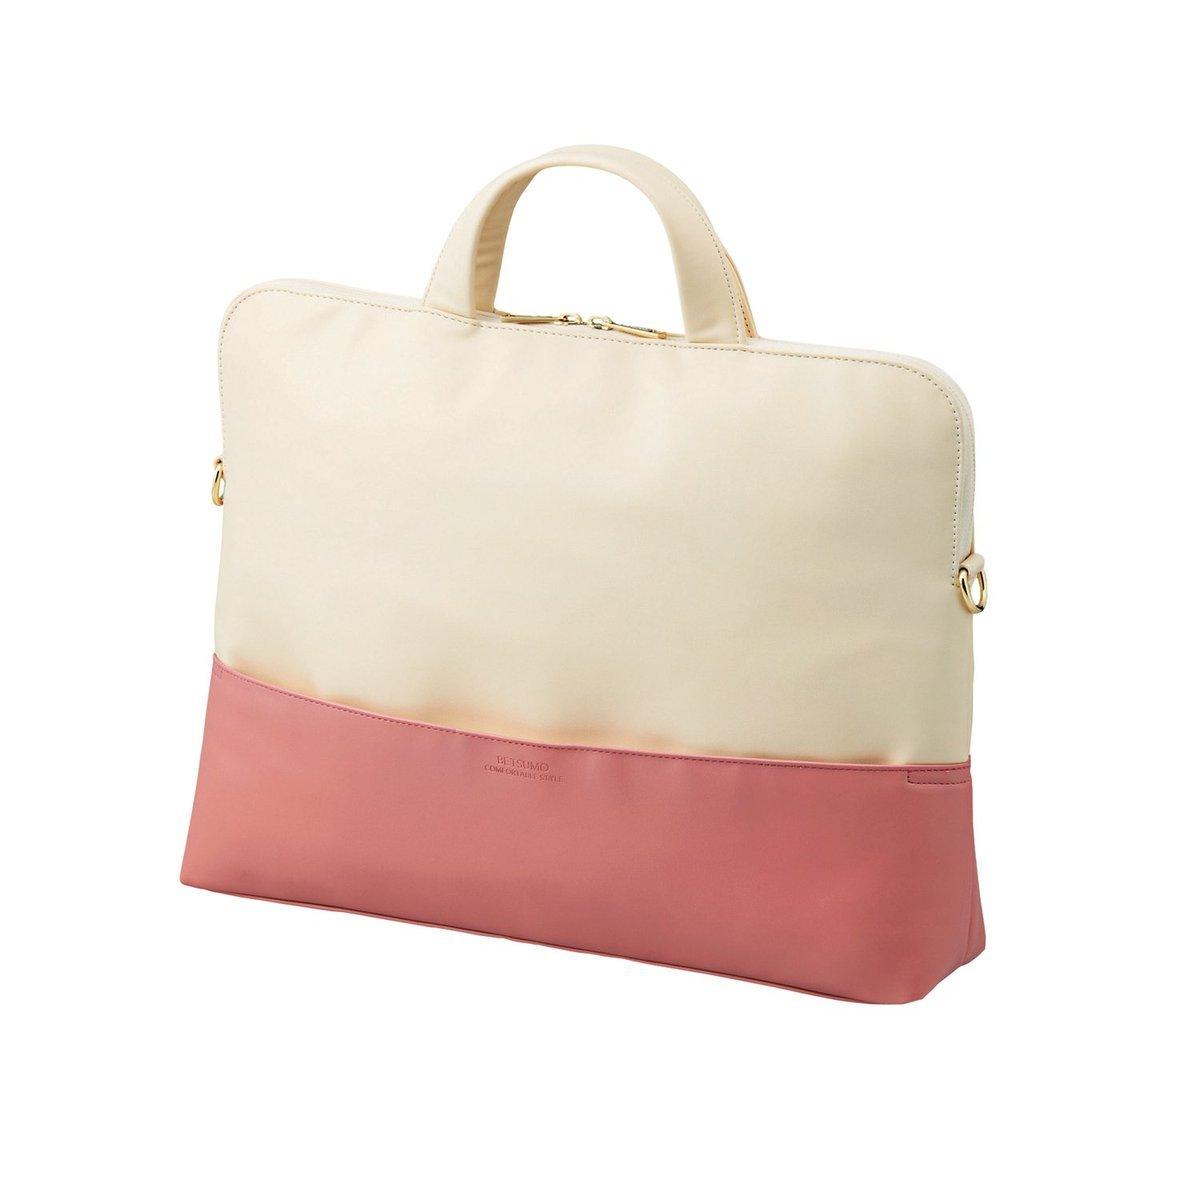 Betsumo 電腦公事包( 粉紅色x 白色- 適用於15.4吋電腦)